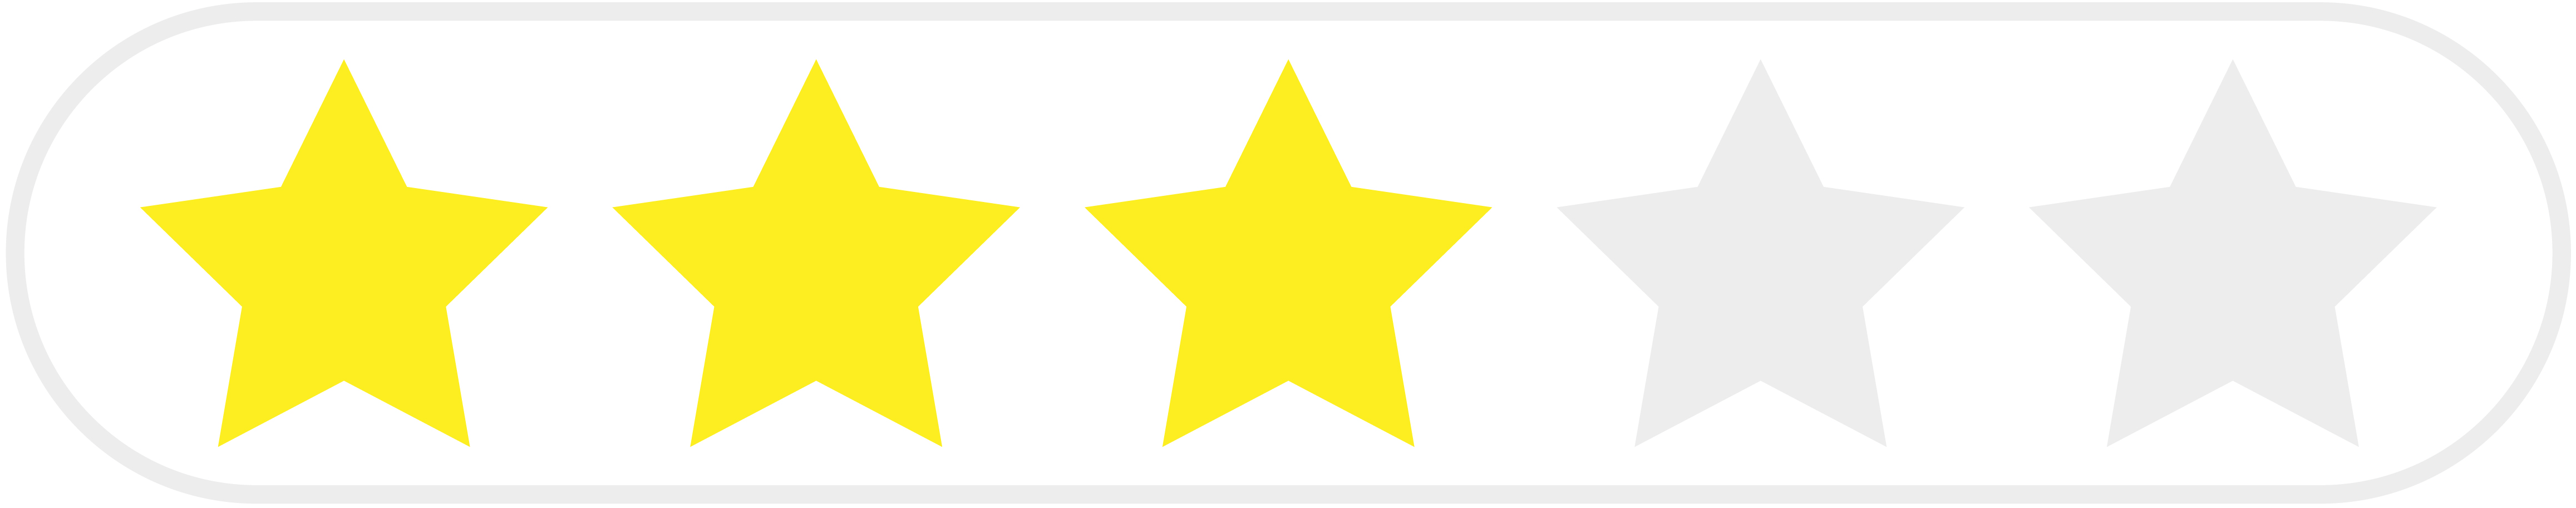 оценка три звезды